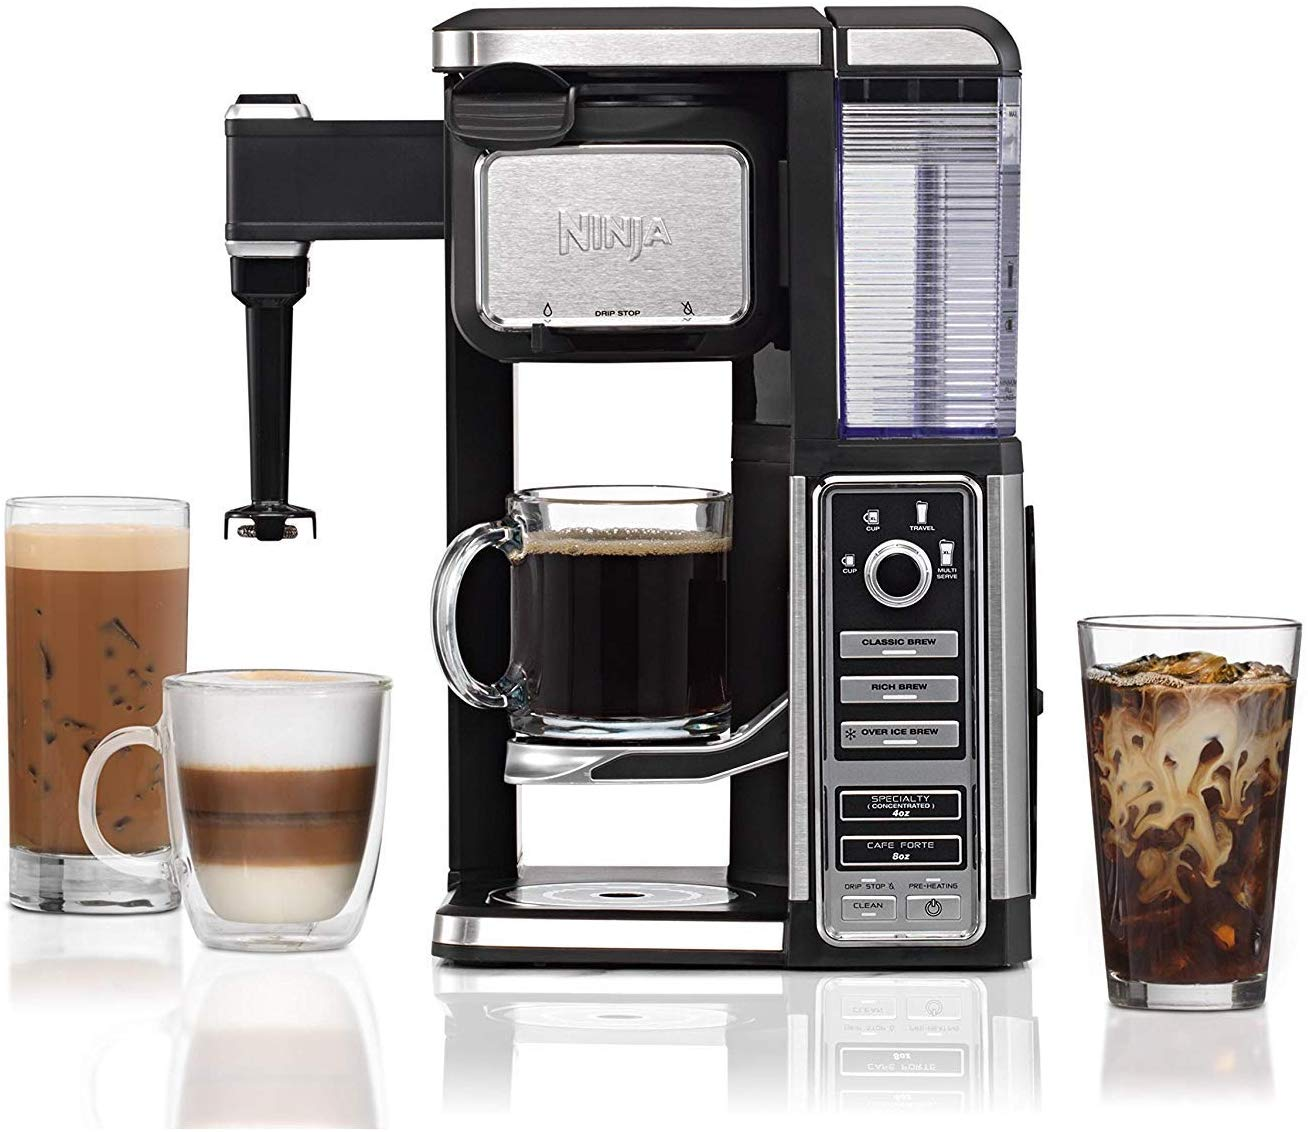 ninja-coffee-maker